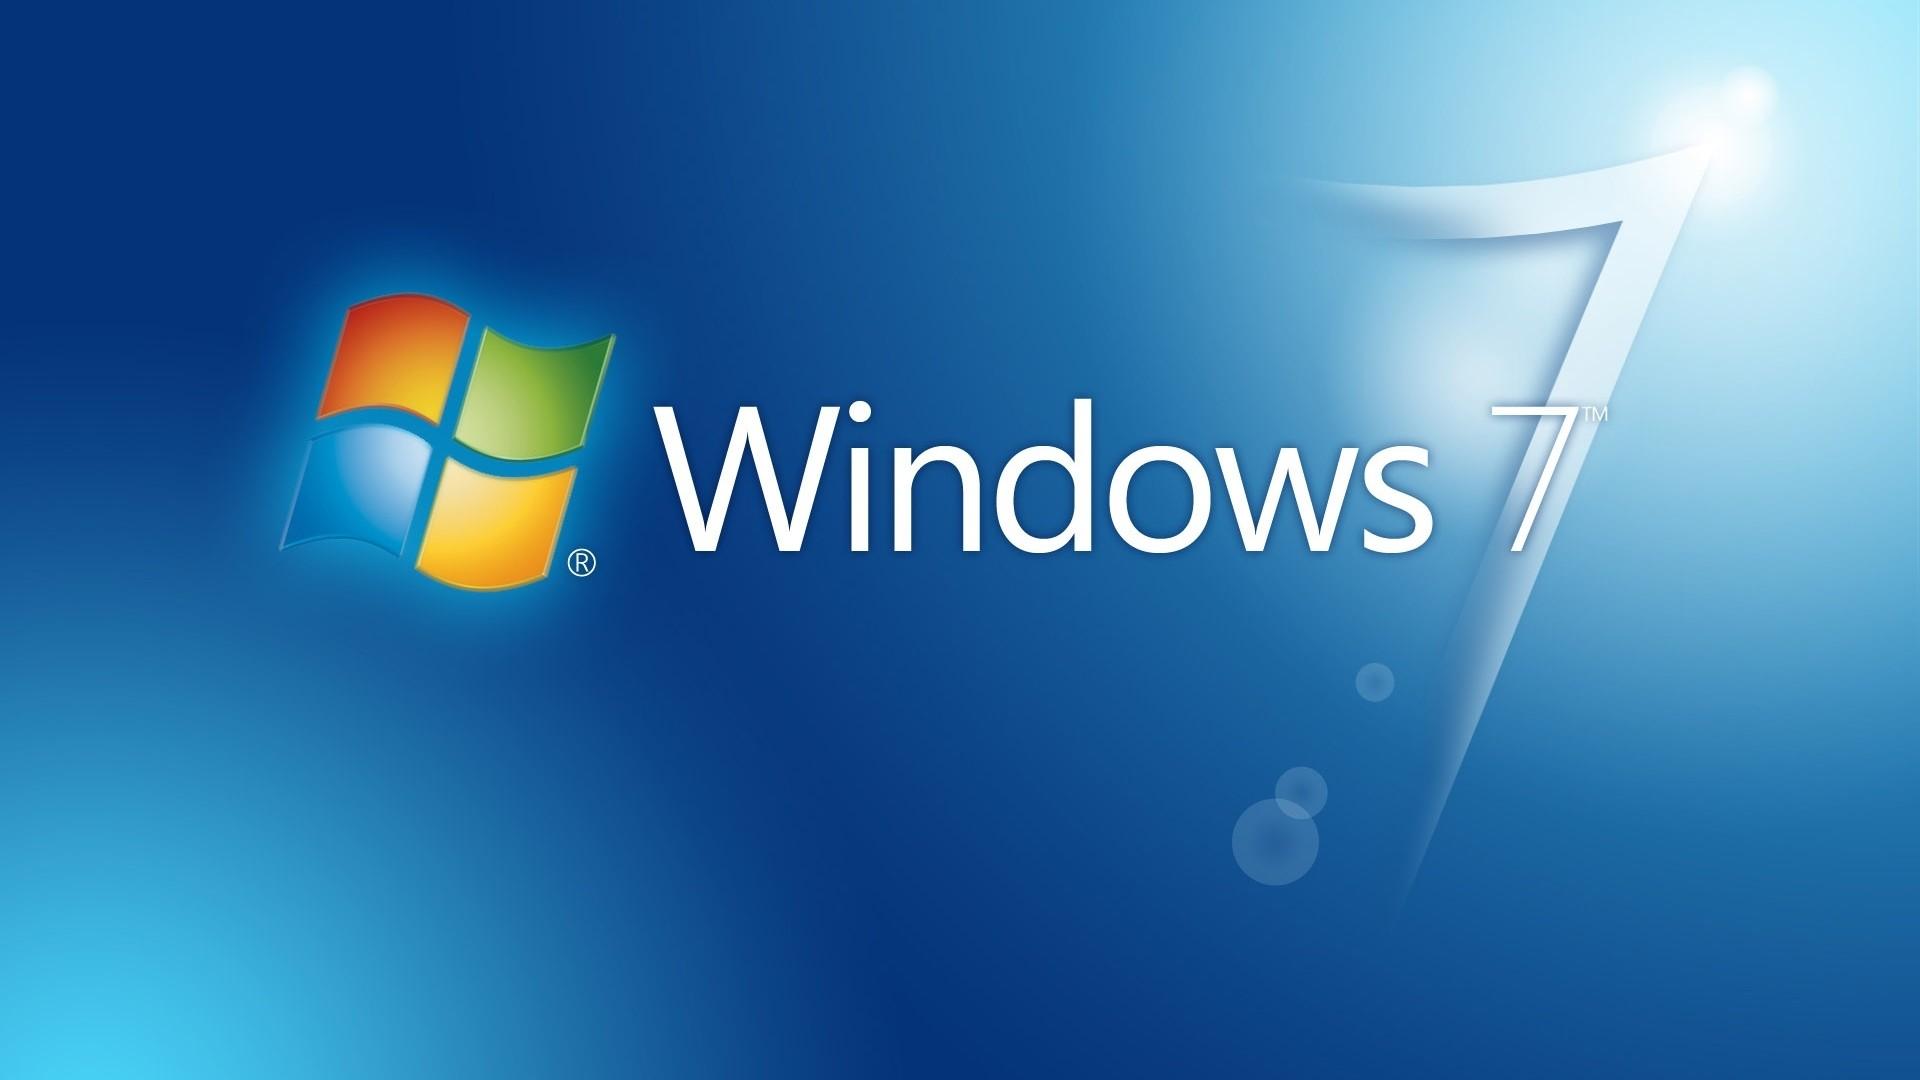 Wallpaper windows 7, win 7, logo